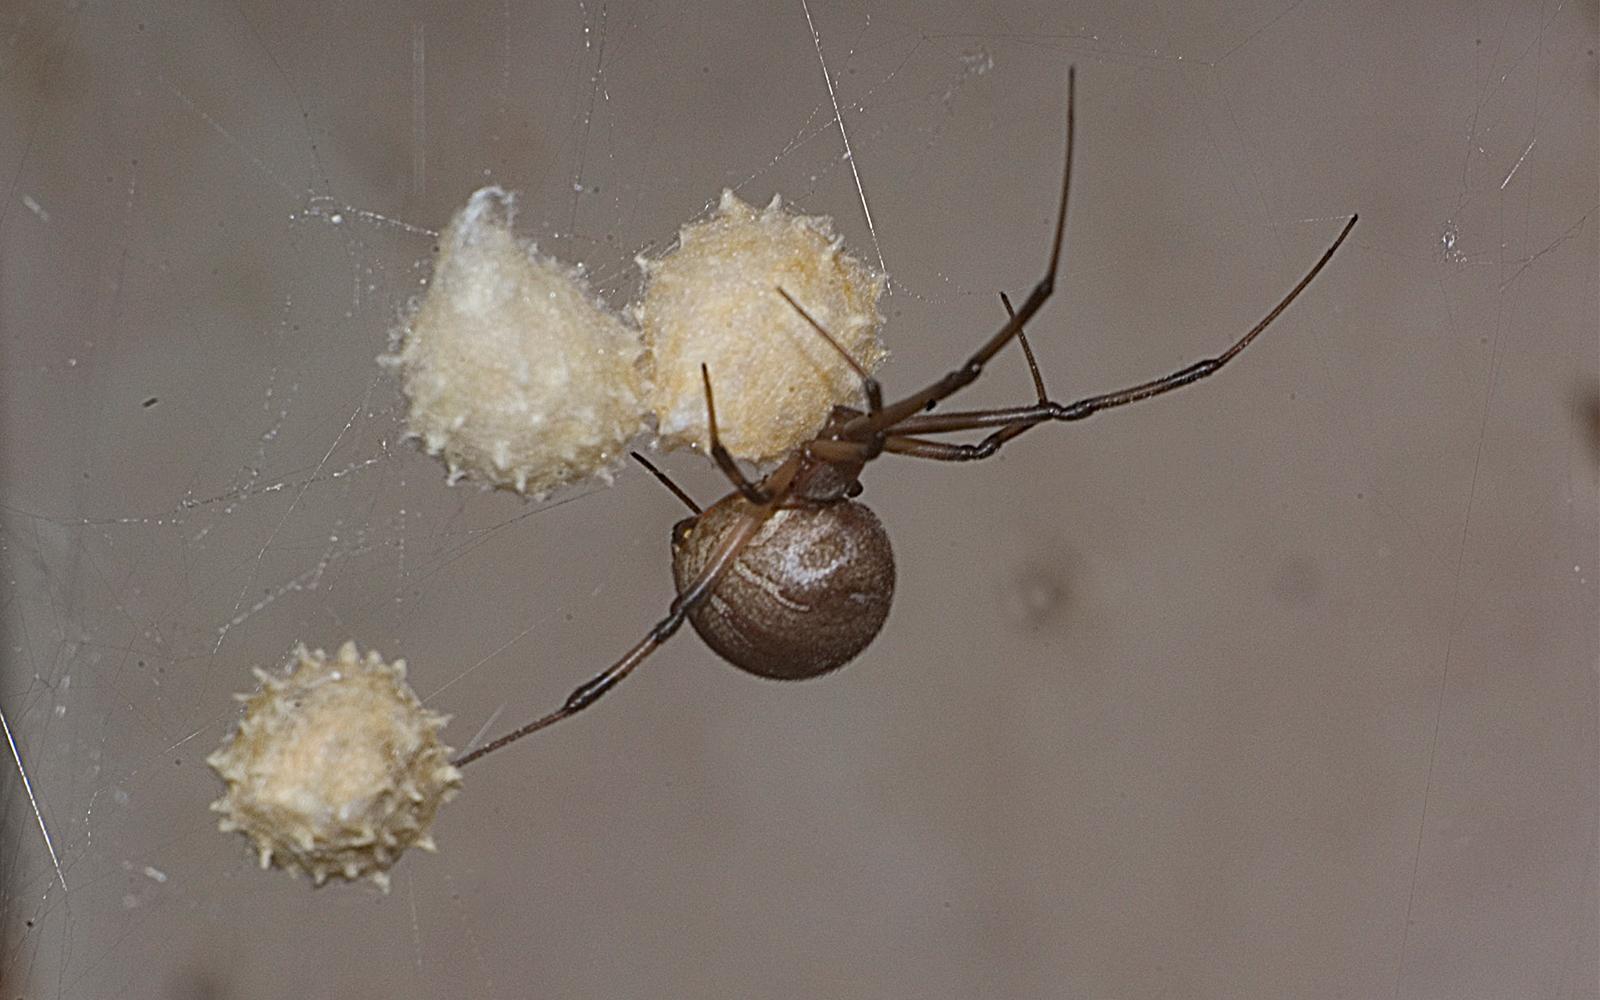 Israeli study: Male brown widow spiders prefer females who